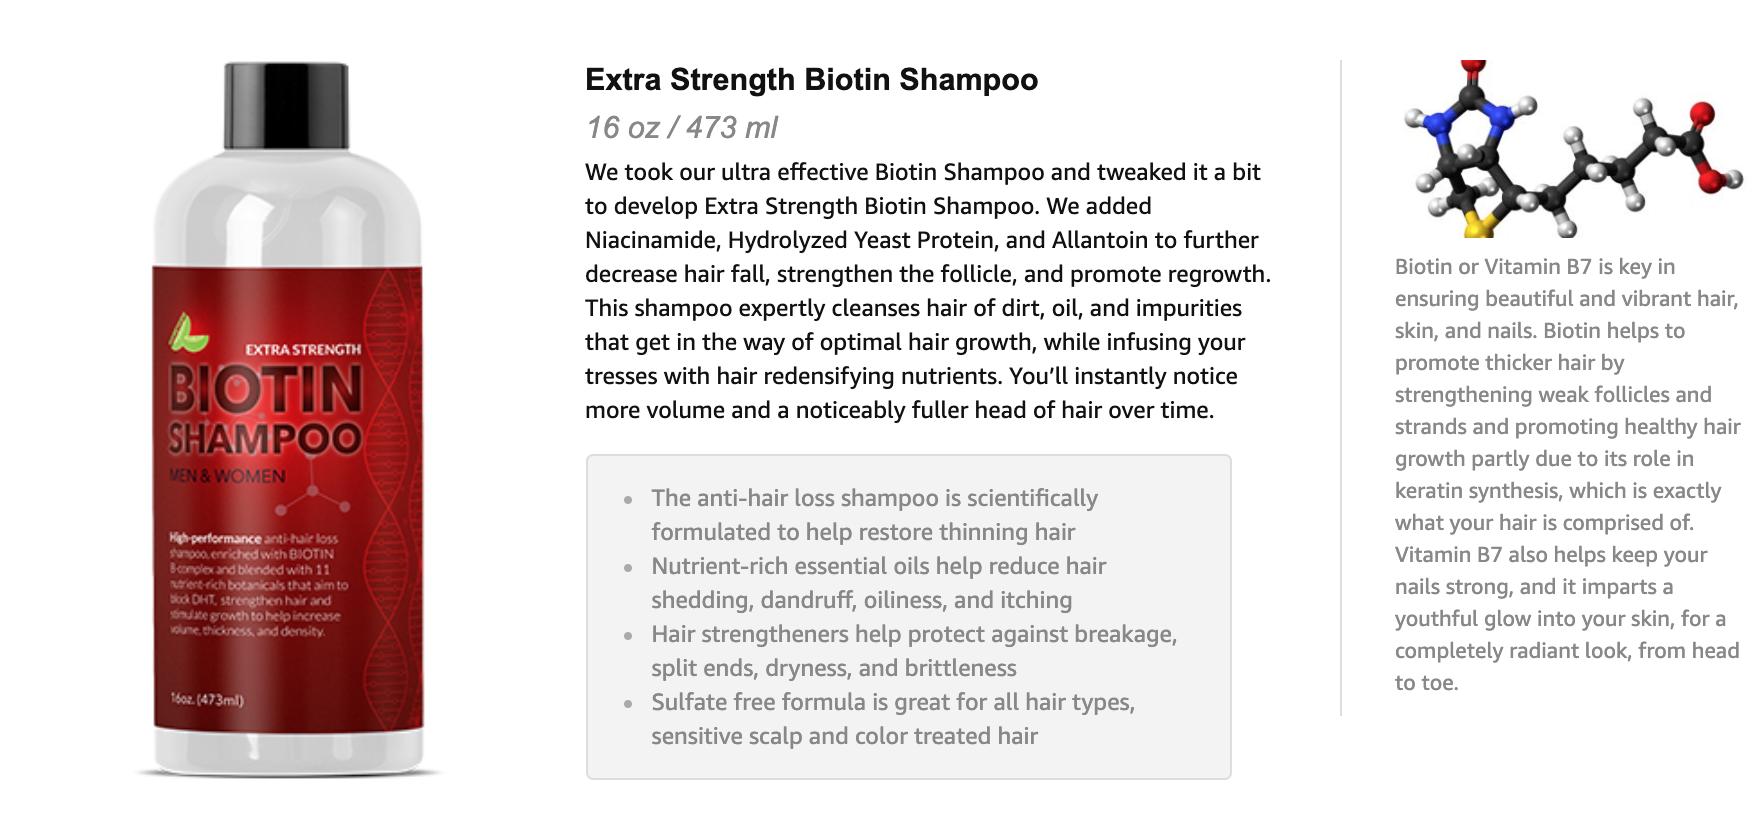 Maple Holistics Biotin Shampoo For Hair Loss - Extra Strength Hair Growth  Treatment - Natural DHT Blocker B Complex Vitamins For Thinning Hair -